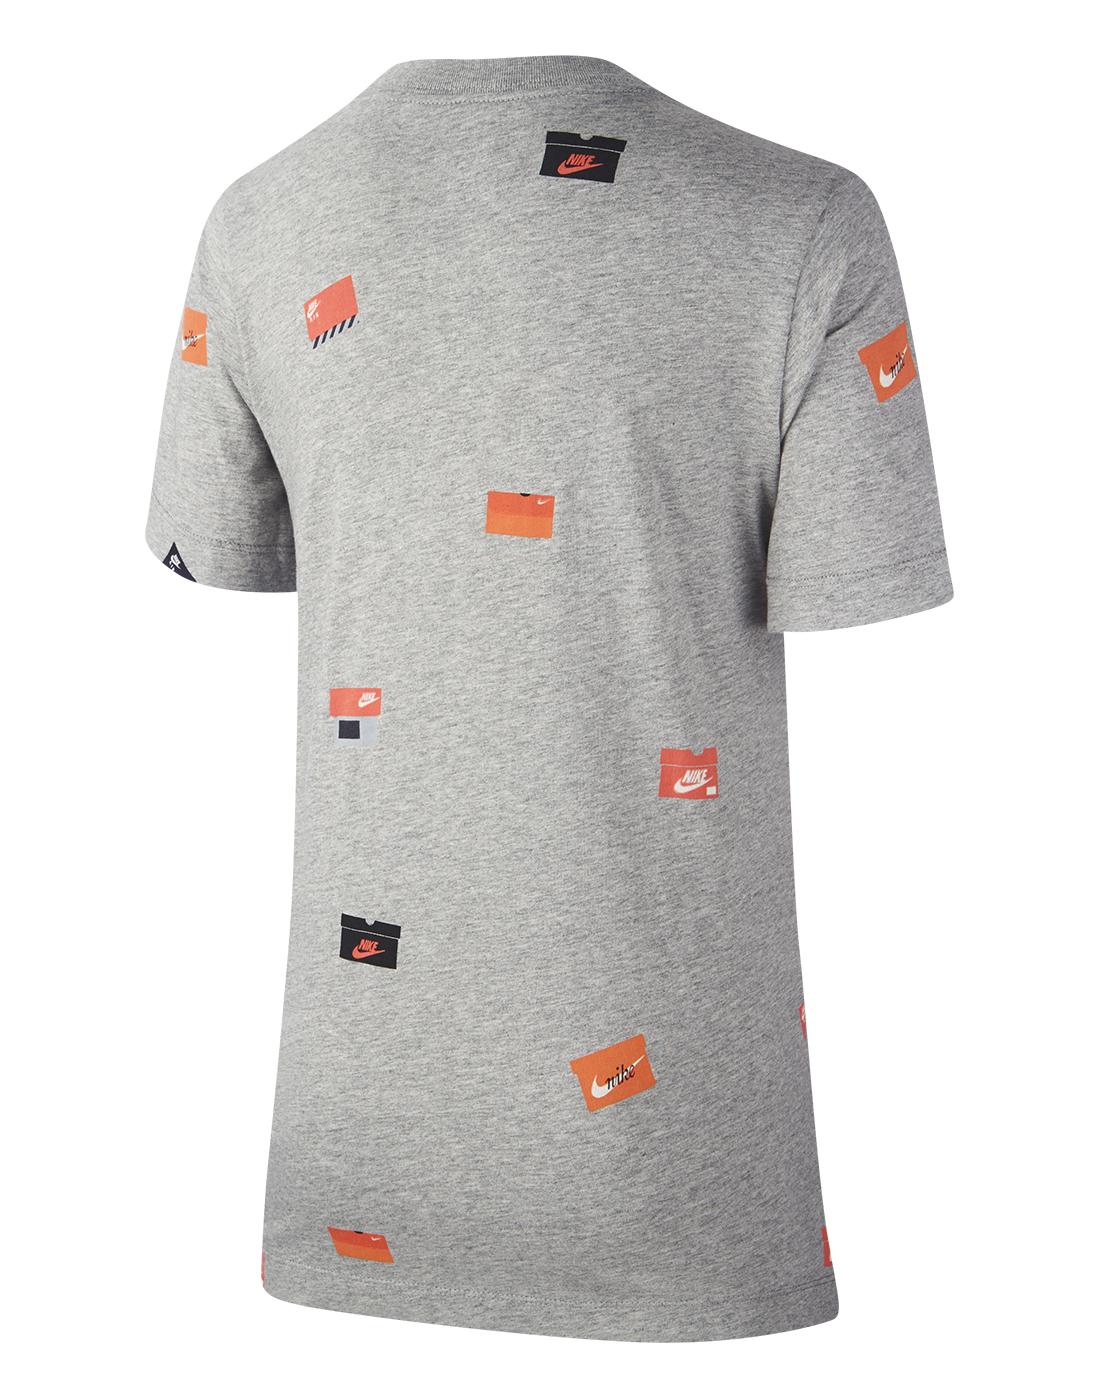 46deed2f5 Nike Older Boys Shoe Box Print T-Shirt | Life Style Sports